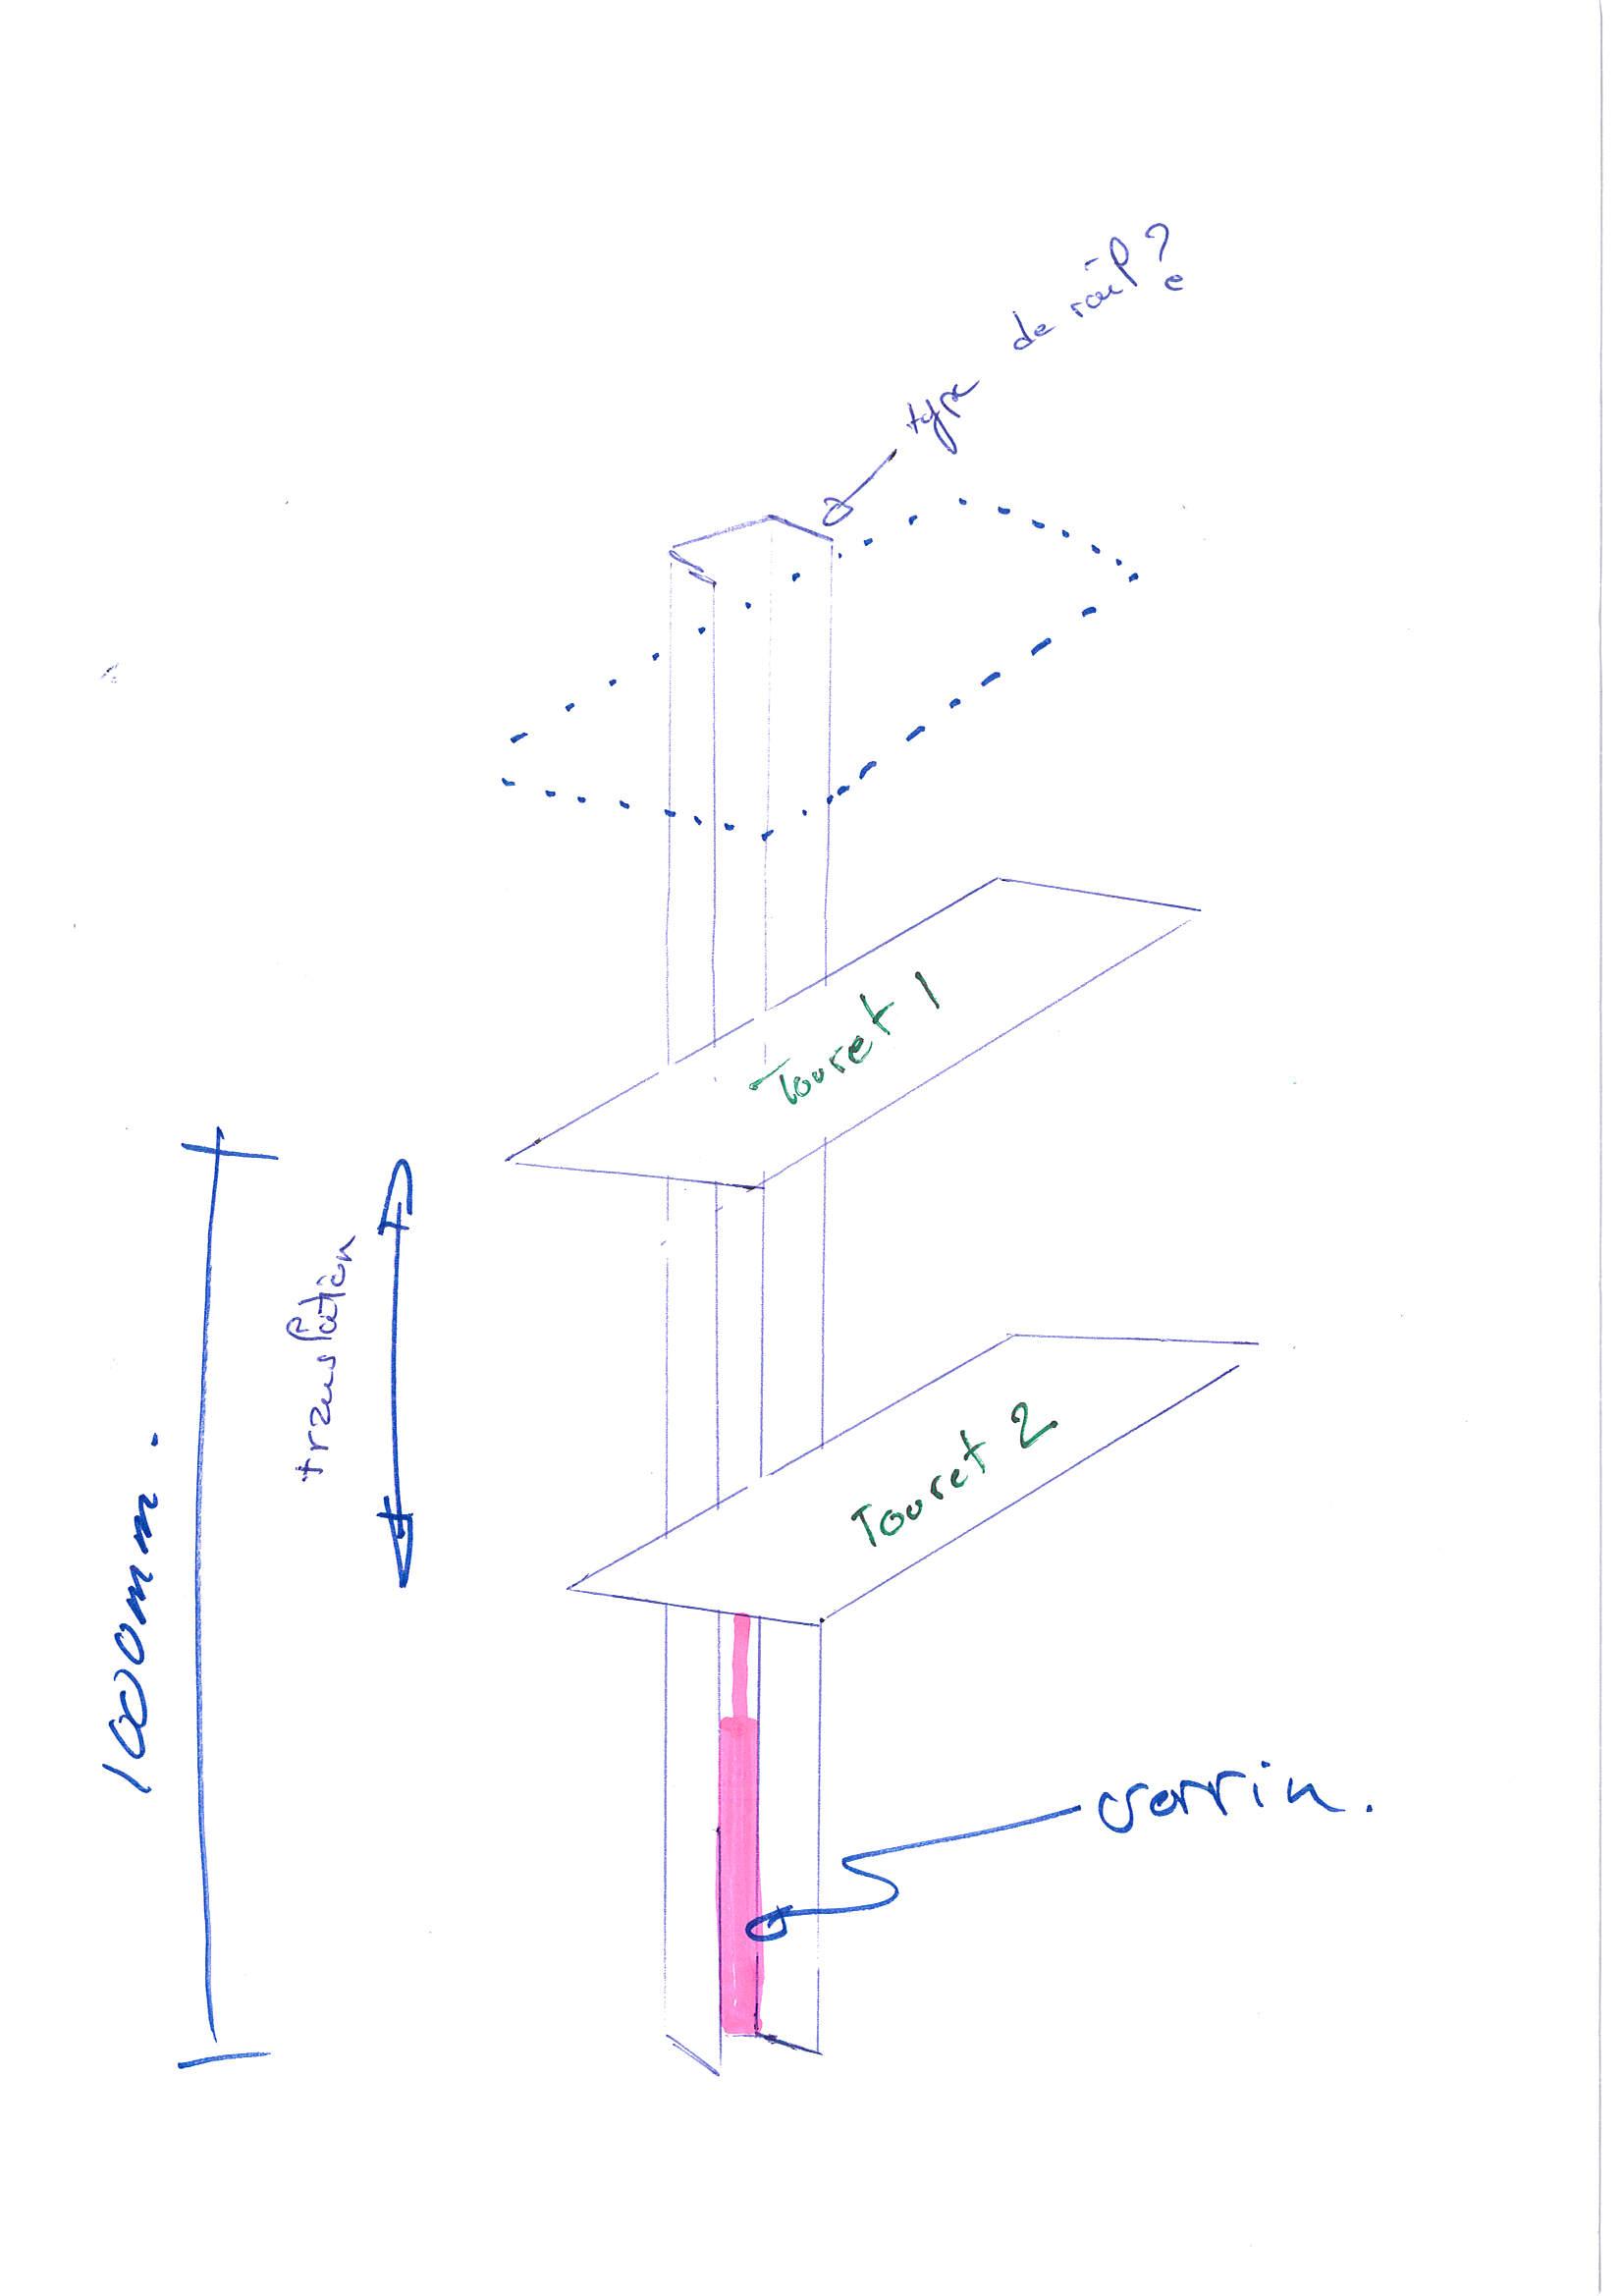 idée de rangement pour touret 333760imp996016valfontenayratpfr20170328104658